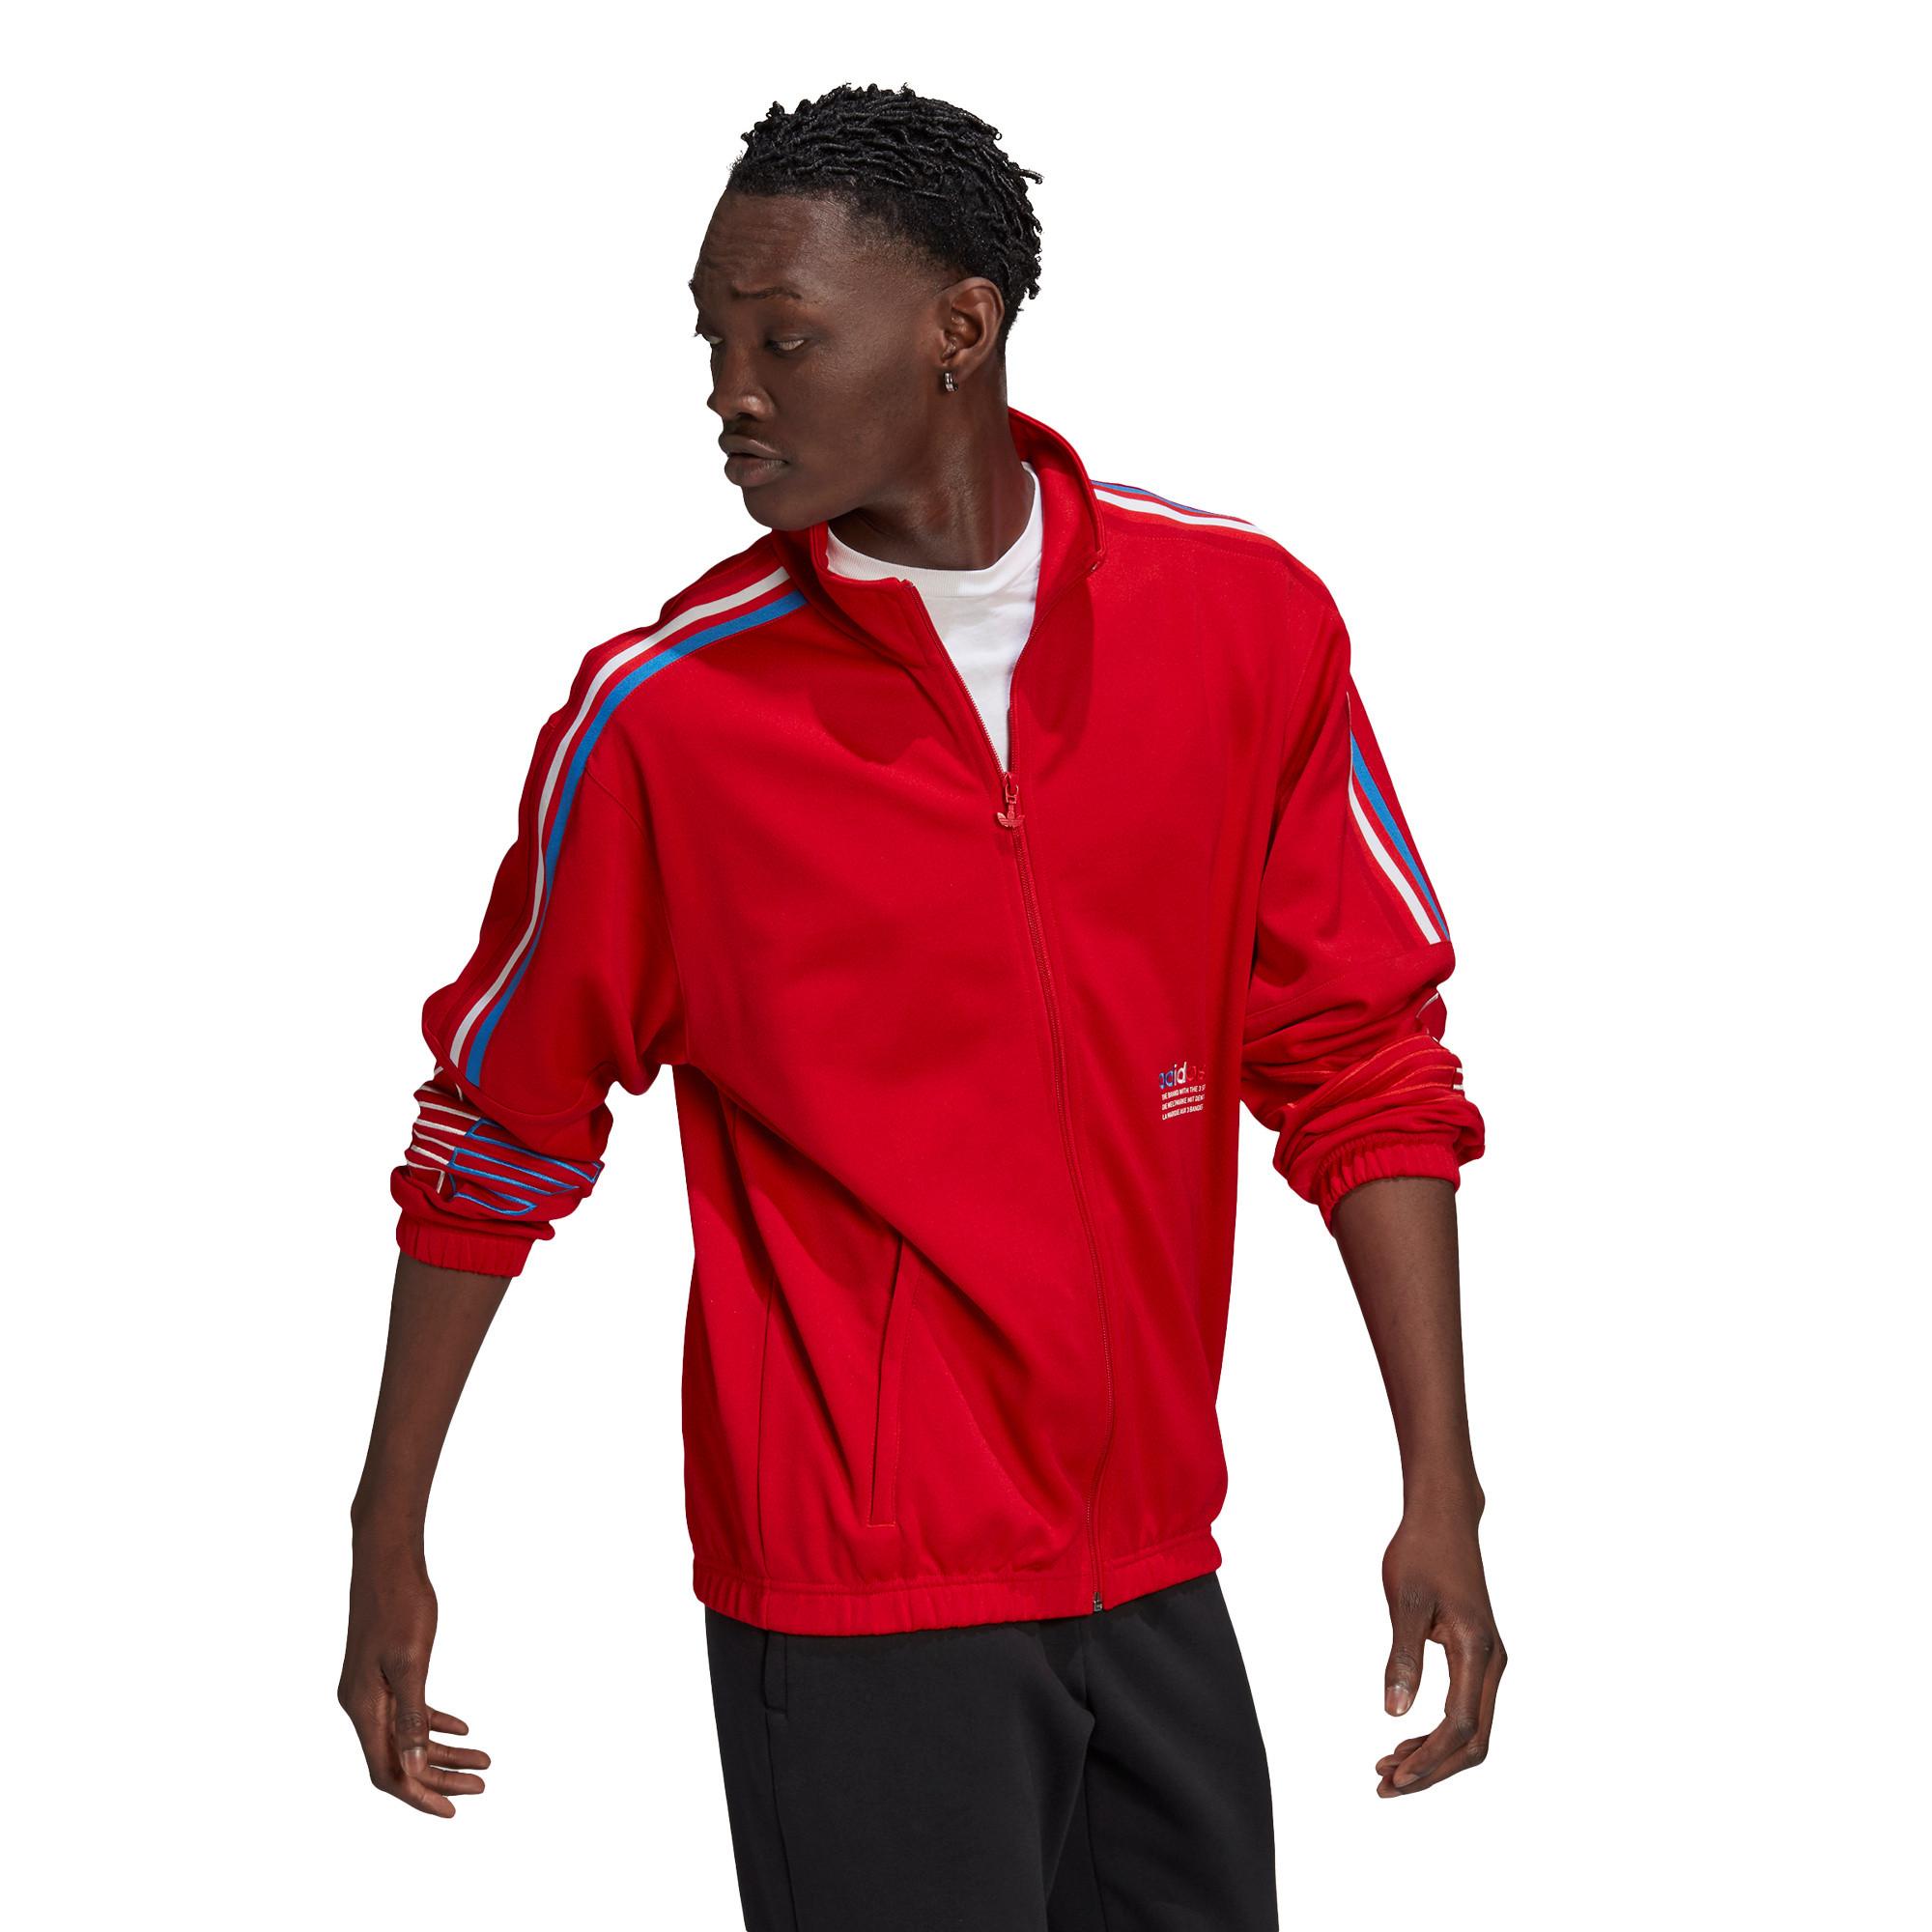 Giacca tuta adicolor FTO Track Jacket, Rosso, large image number 3